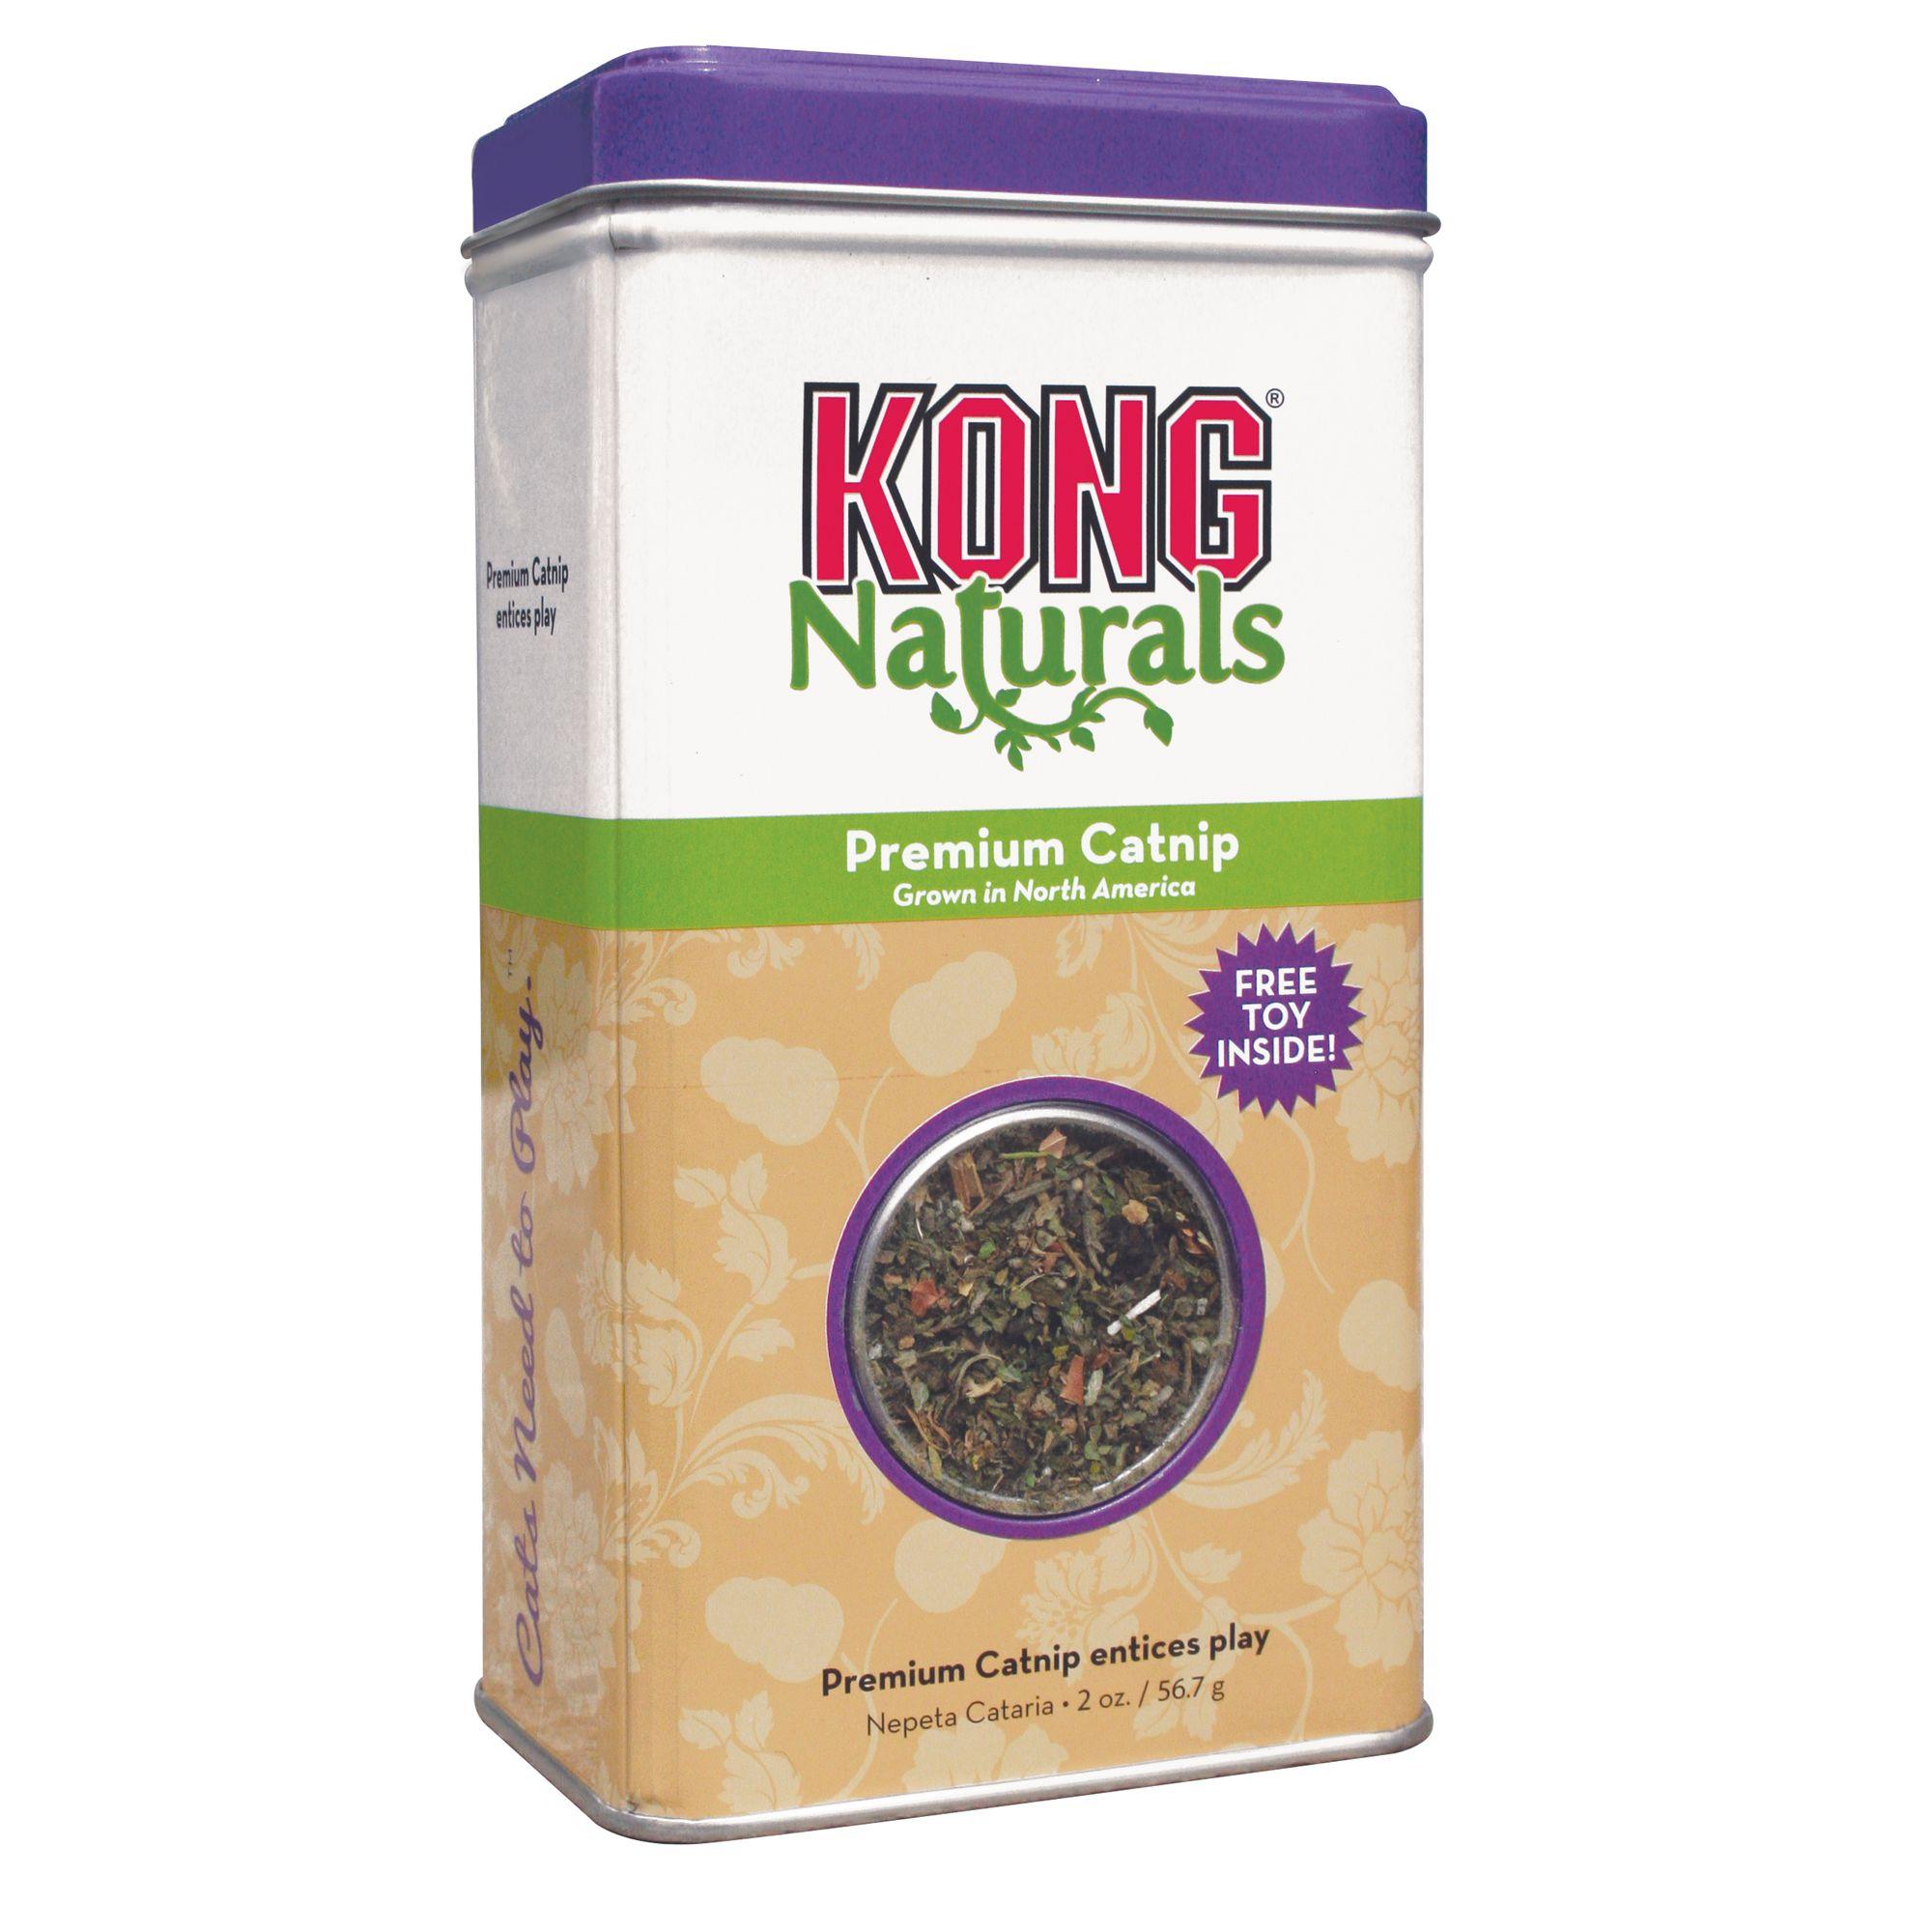 Kong® Premium Catnip size: 1 Oz 5158941